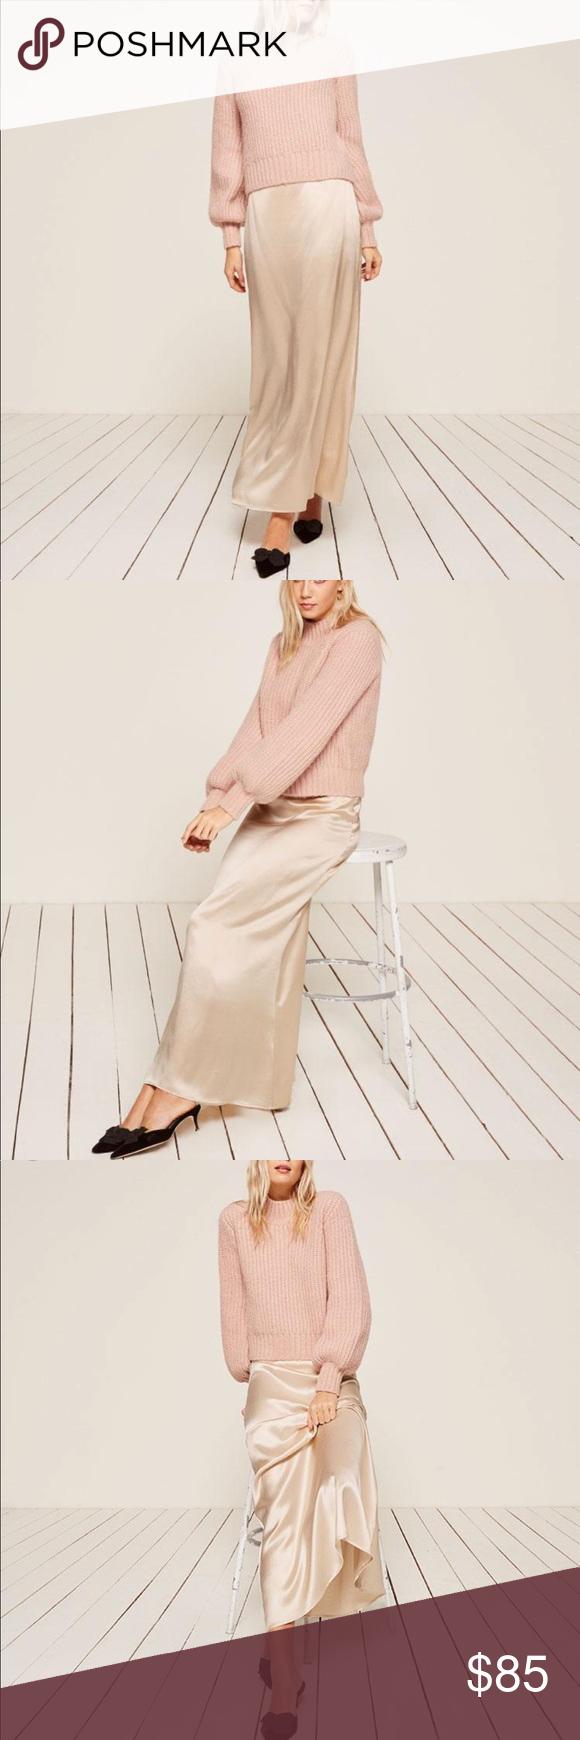 Reformation Gianna Skirt Blush sz 4/Small | Clothes design